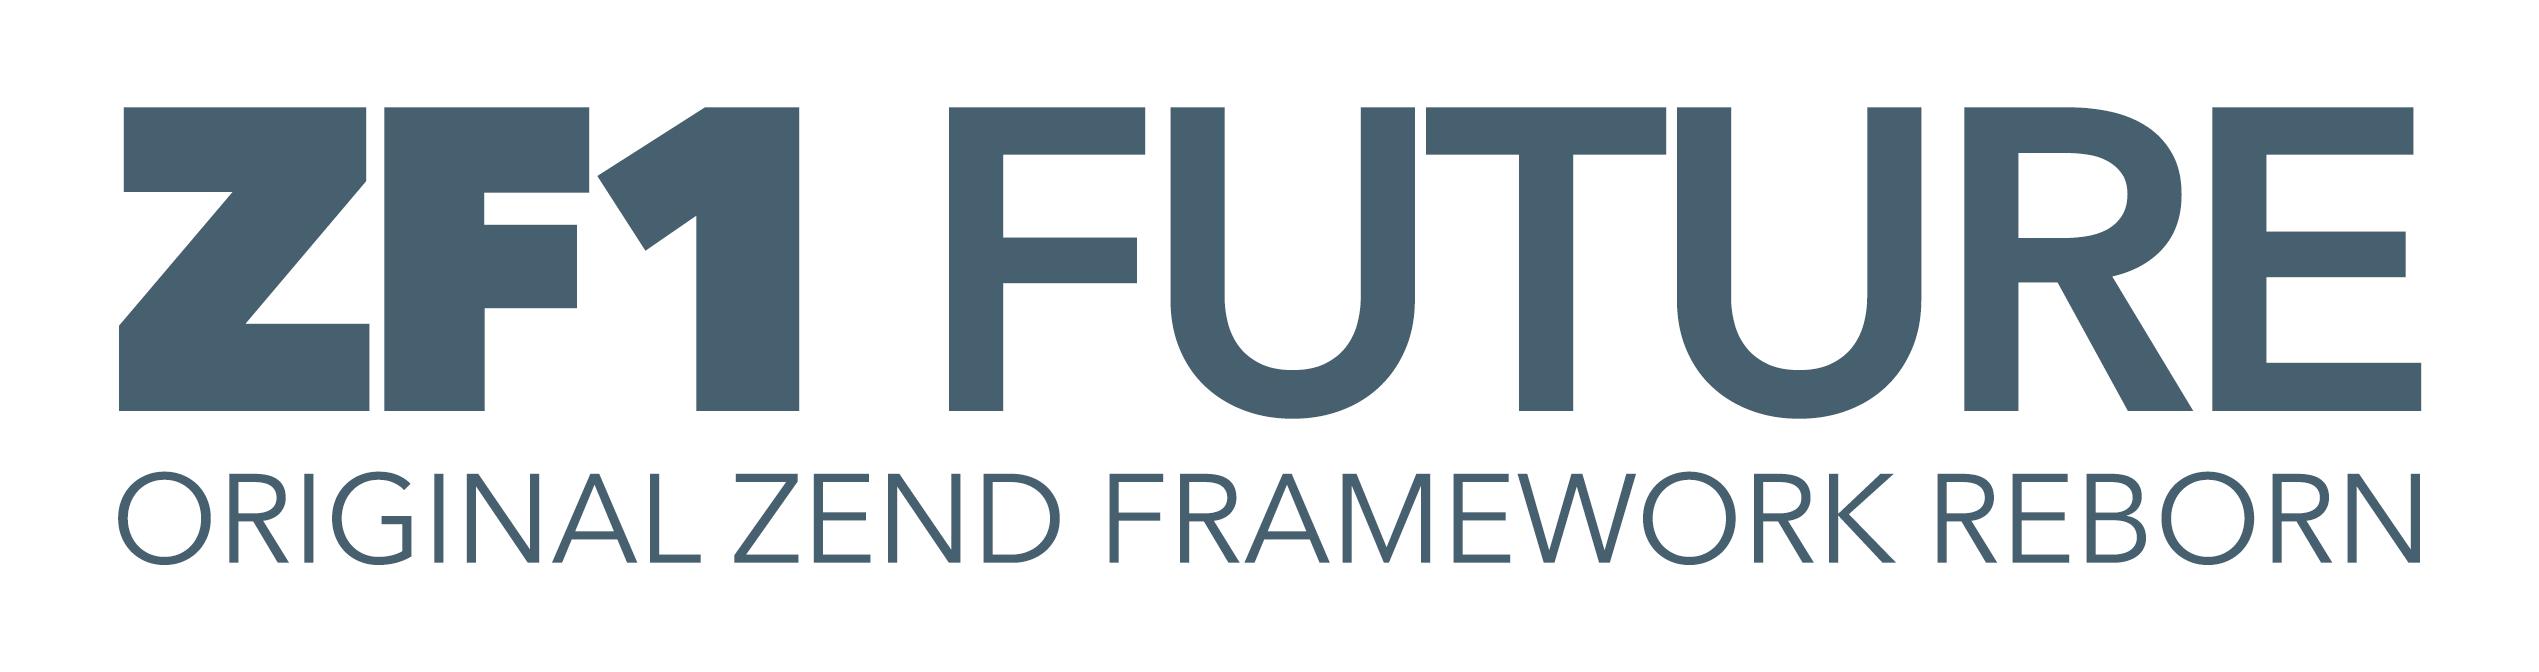 zf1-future logo